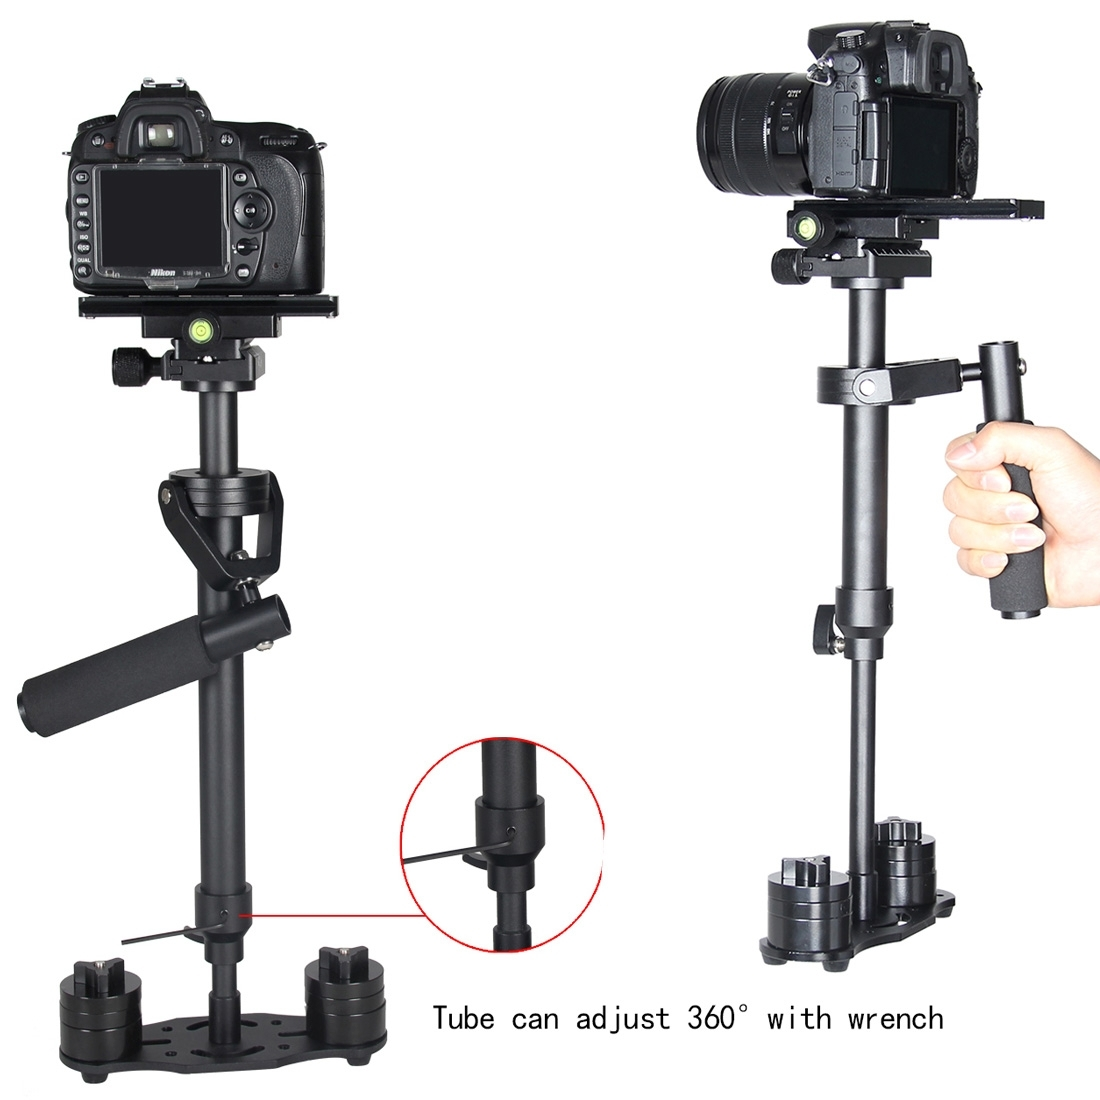 YELANGU S60N Handheld Steady Stabilizer 360° For DSLR Canon Camera